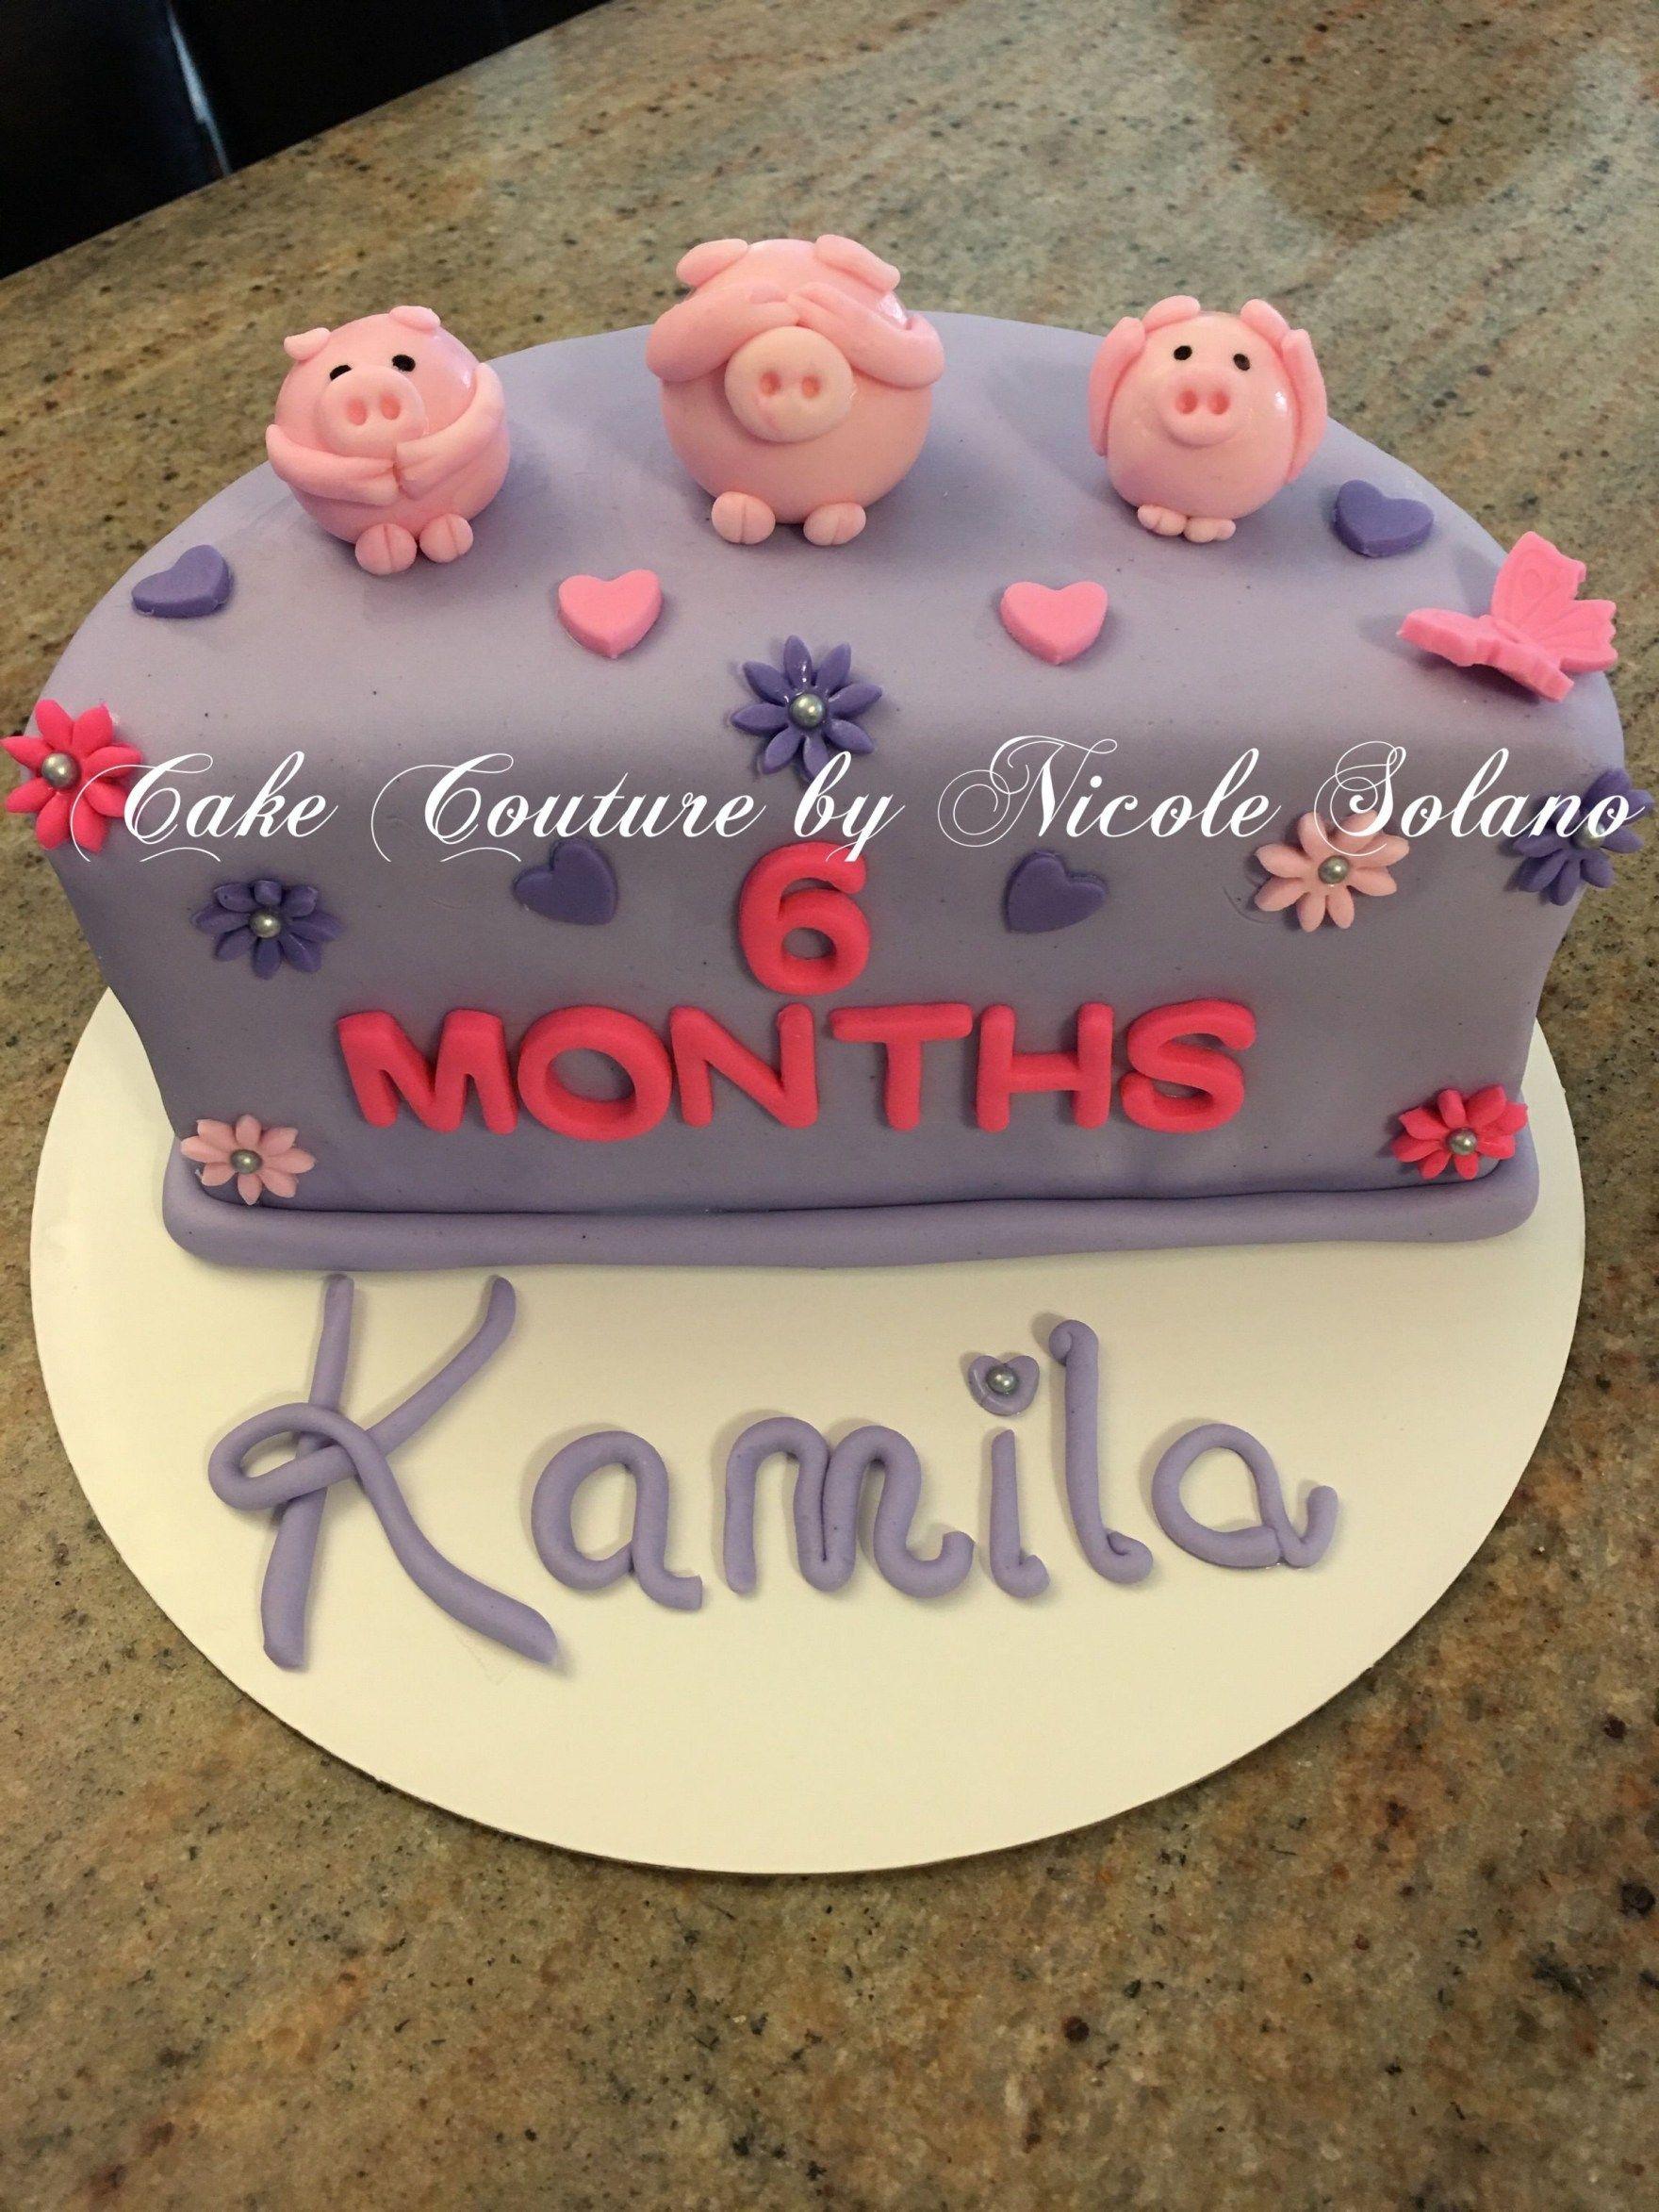 Prime 6 Month Birthday Cake 6 Month Half Cake Three Little Pigs Cake Personalised Birthday Cards Paralily Jamesorg